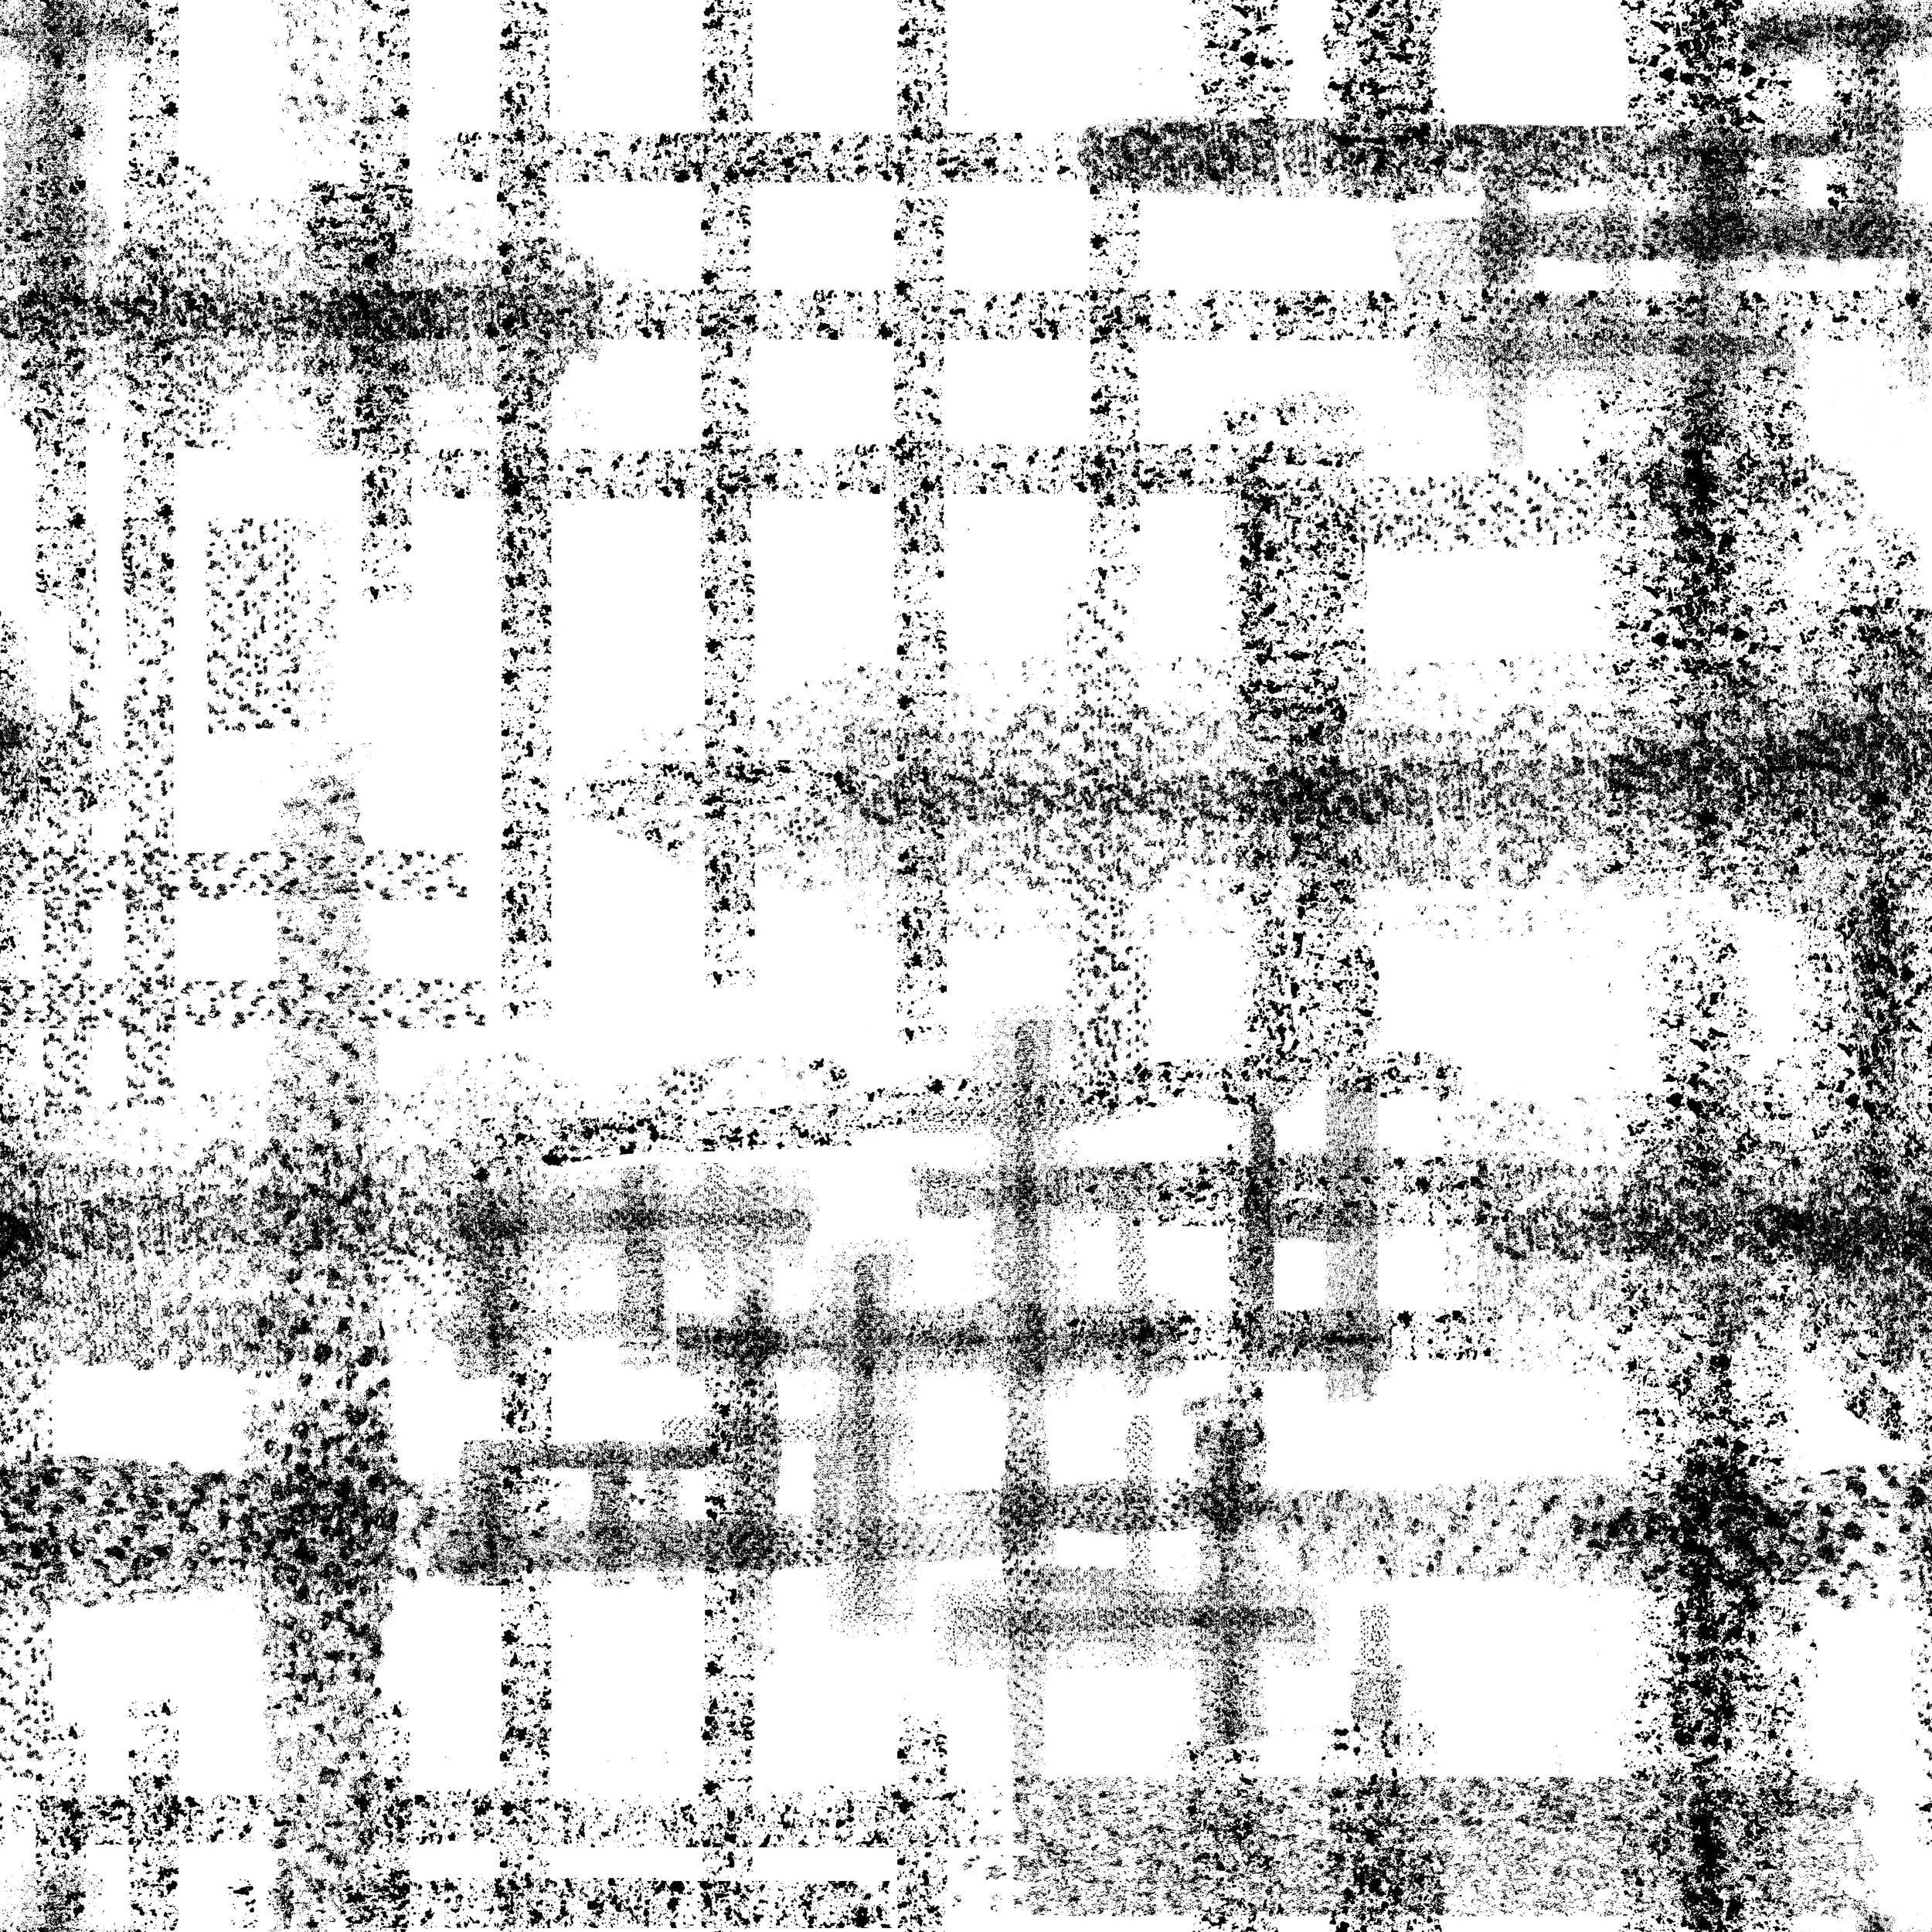 Alpaca Plaid_Unit 50cm50cm (1) copy.jpg